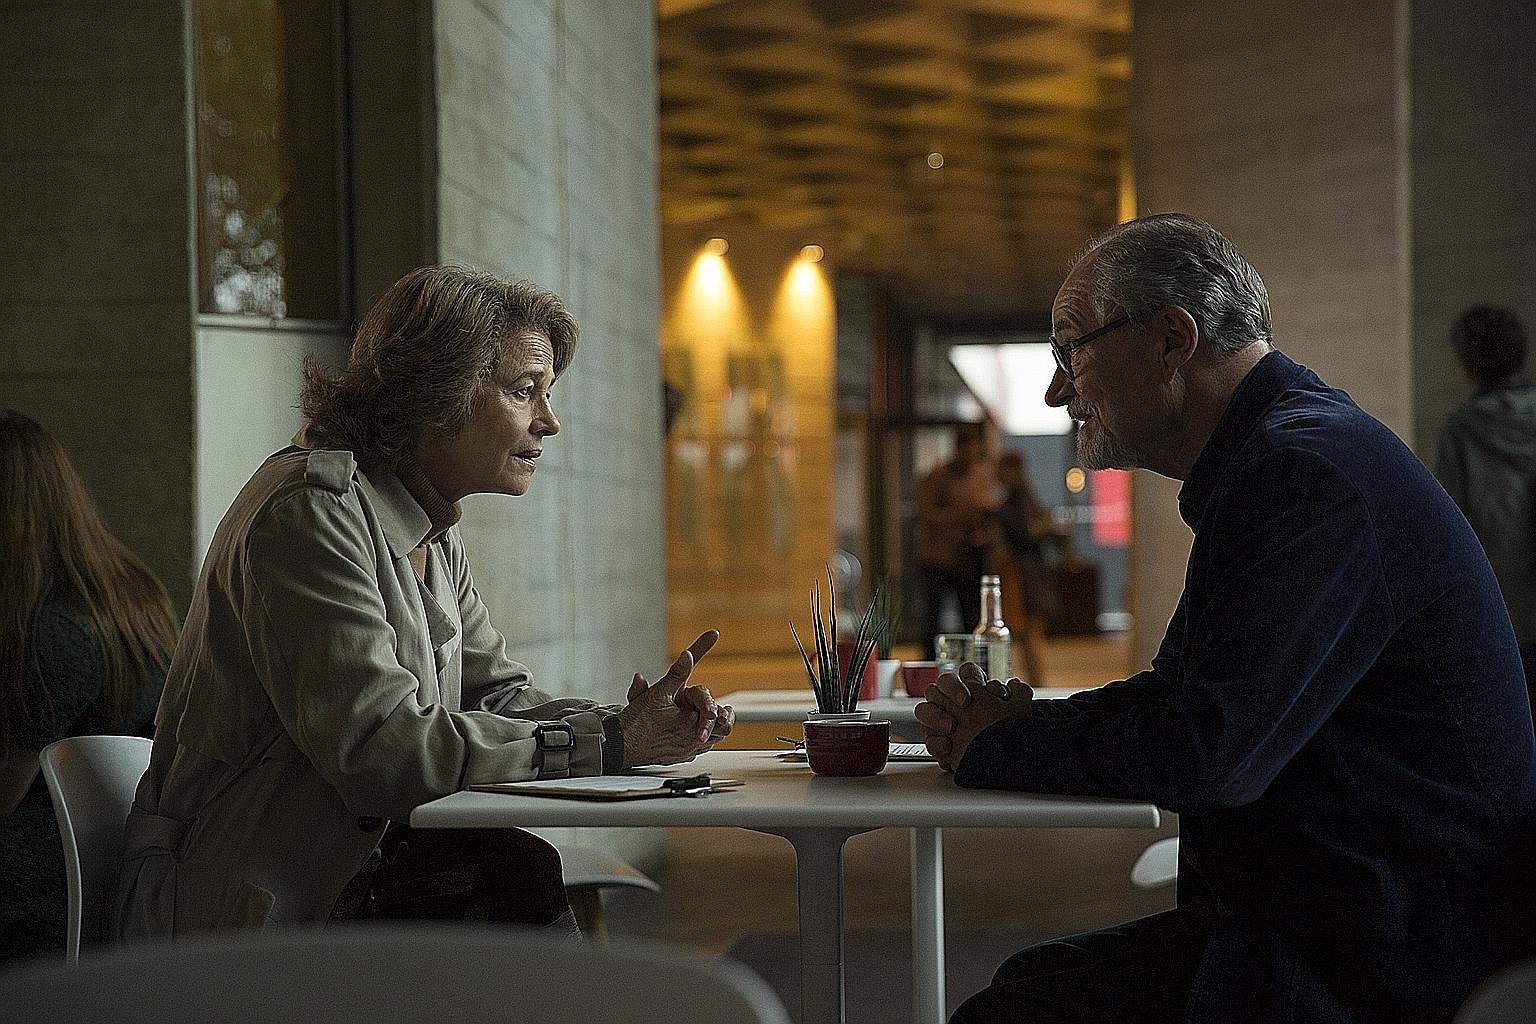 Jim Broadbent and Charlotte Rampling in The Sense Of An Ending.